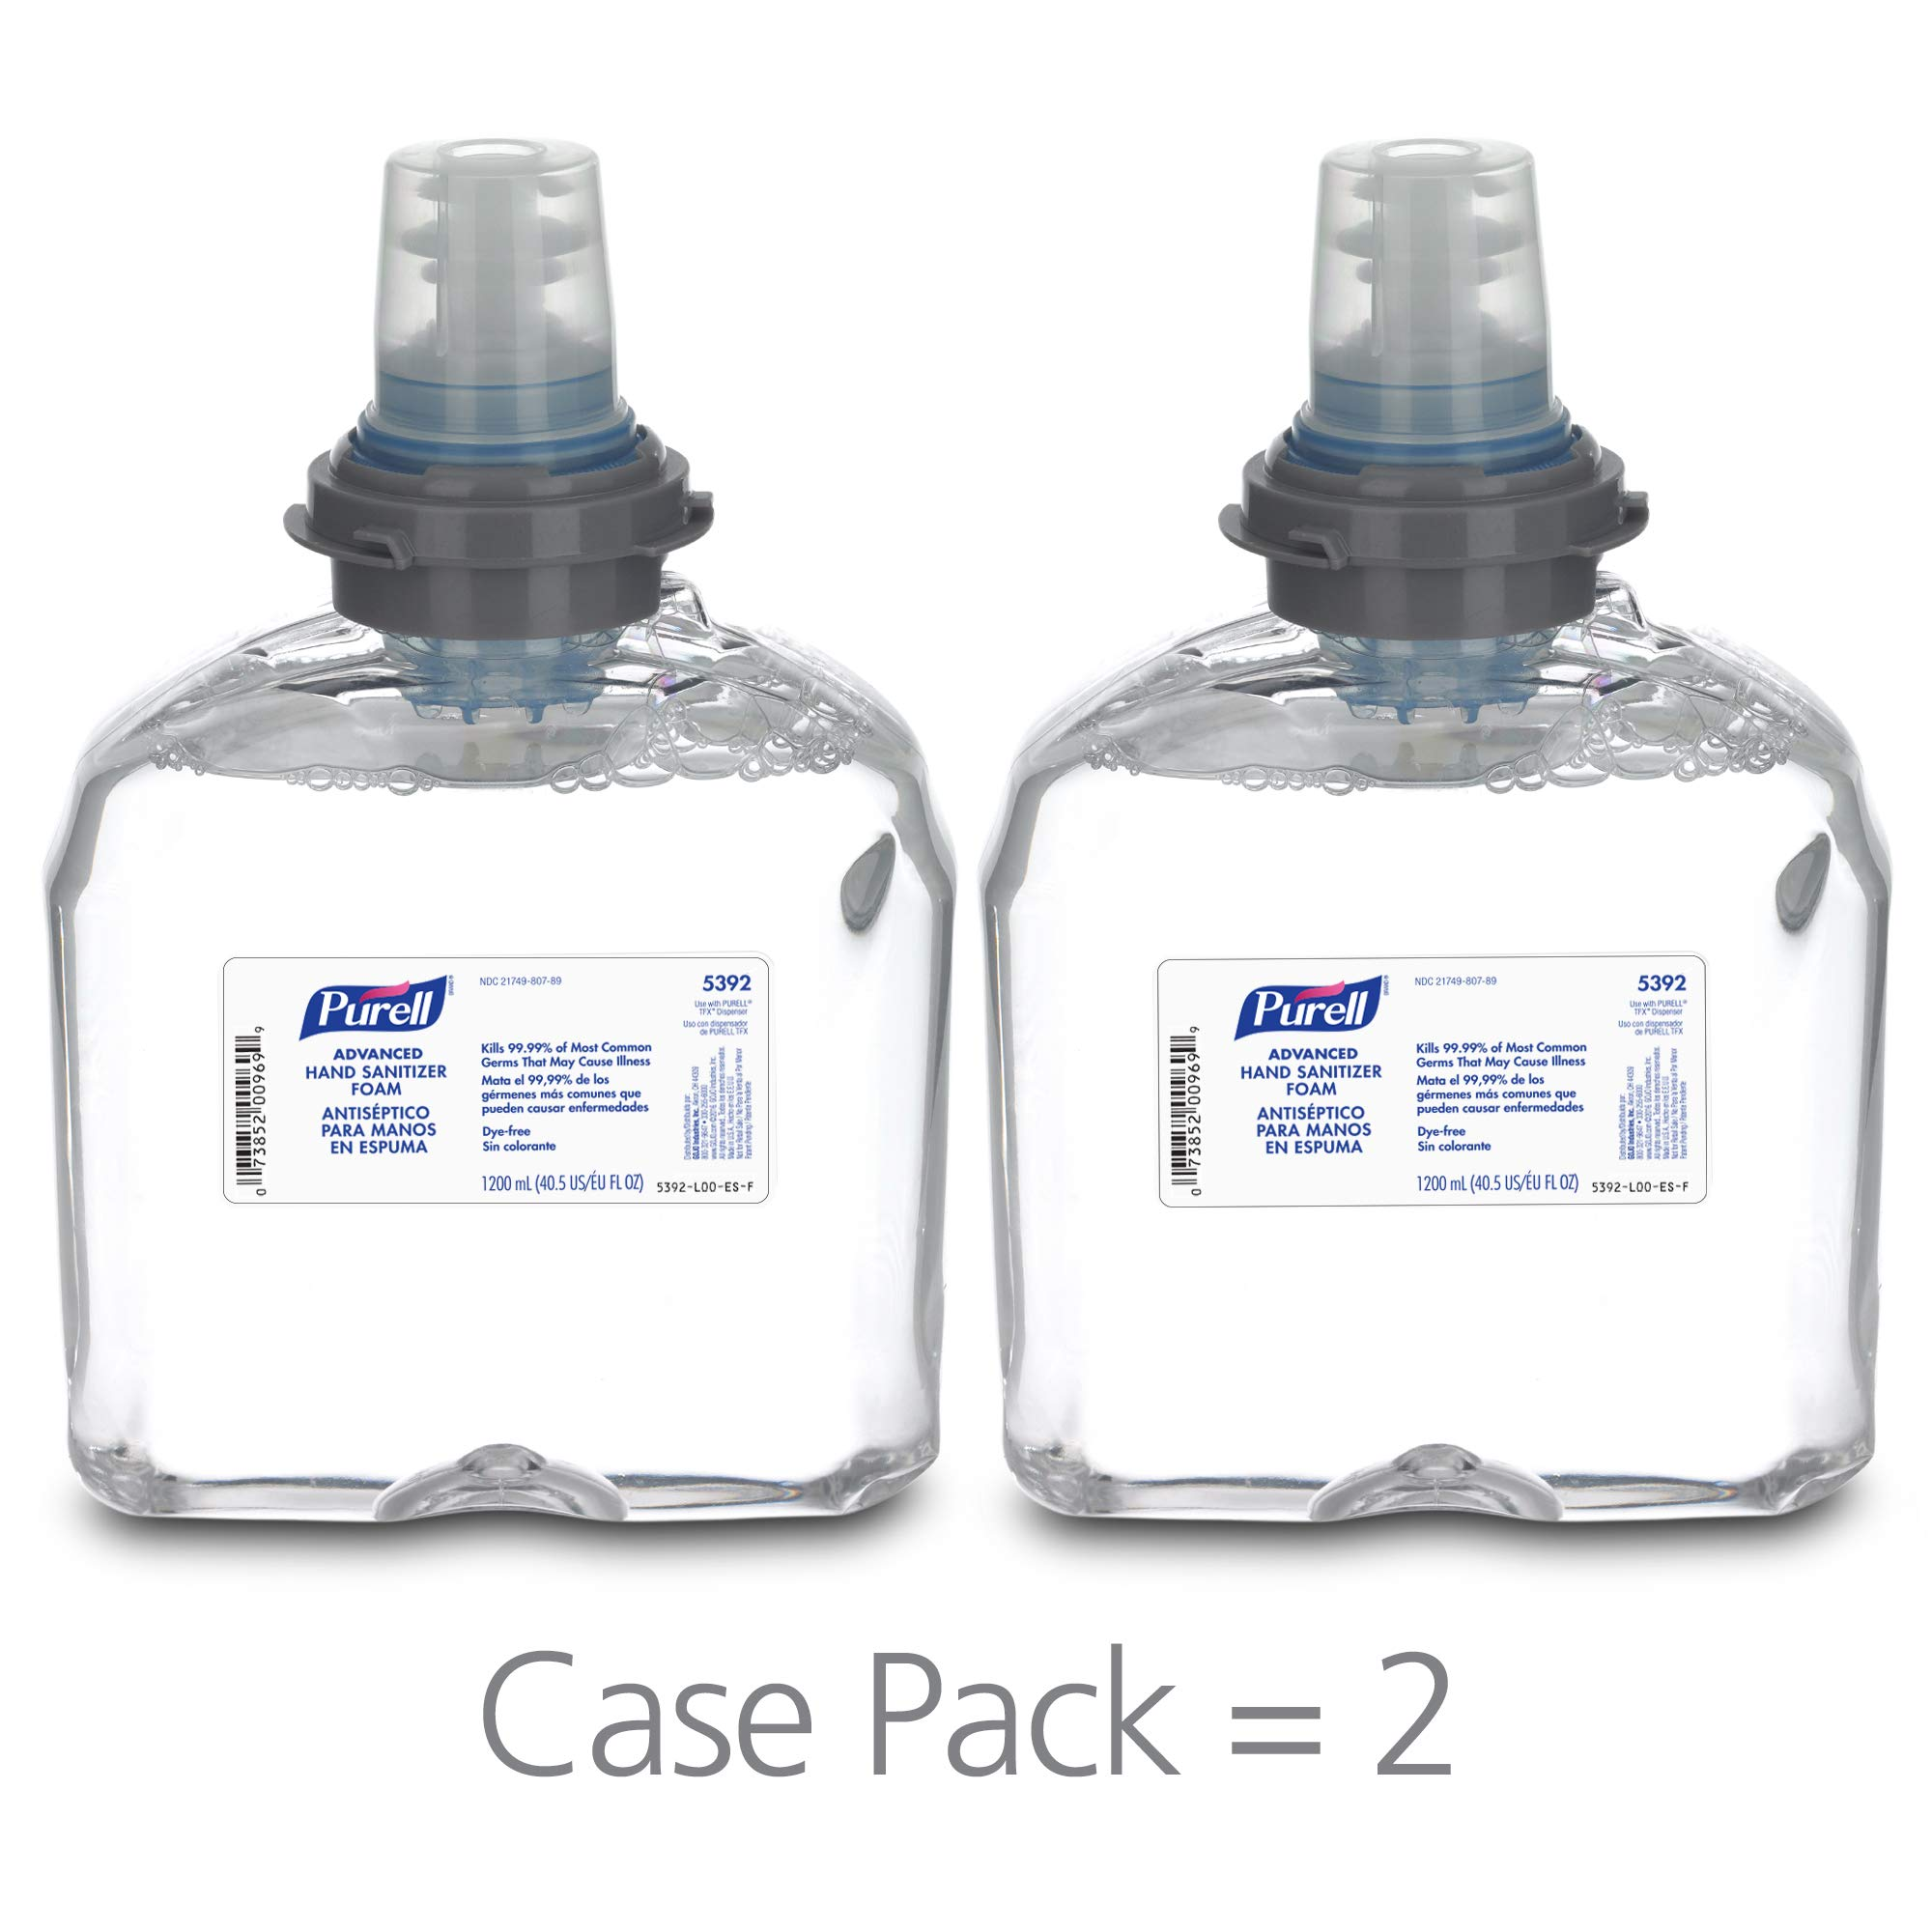 PURELL TFX Advanced Hand Sanitizer Foam, 1200 mL Sanitizer Foam Refill for PURELL TFX Touch